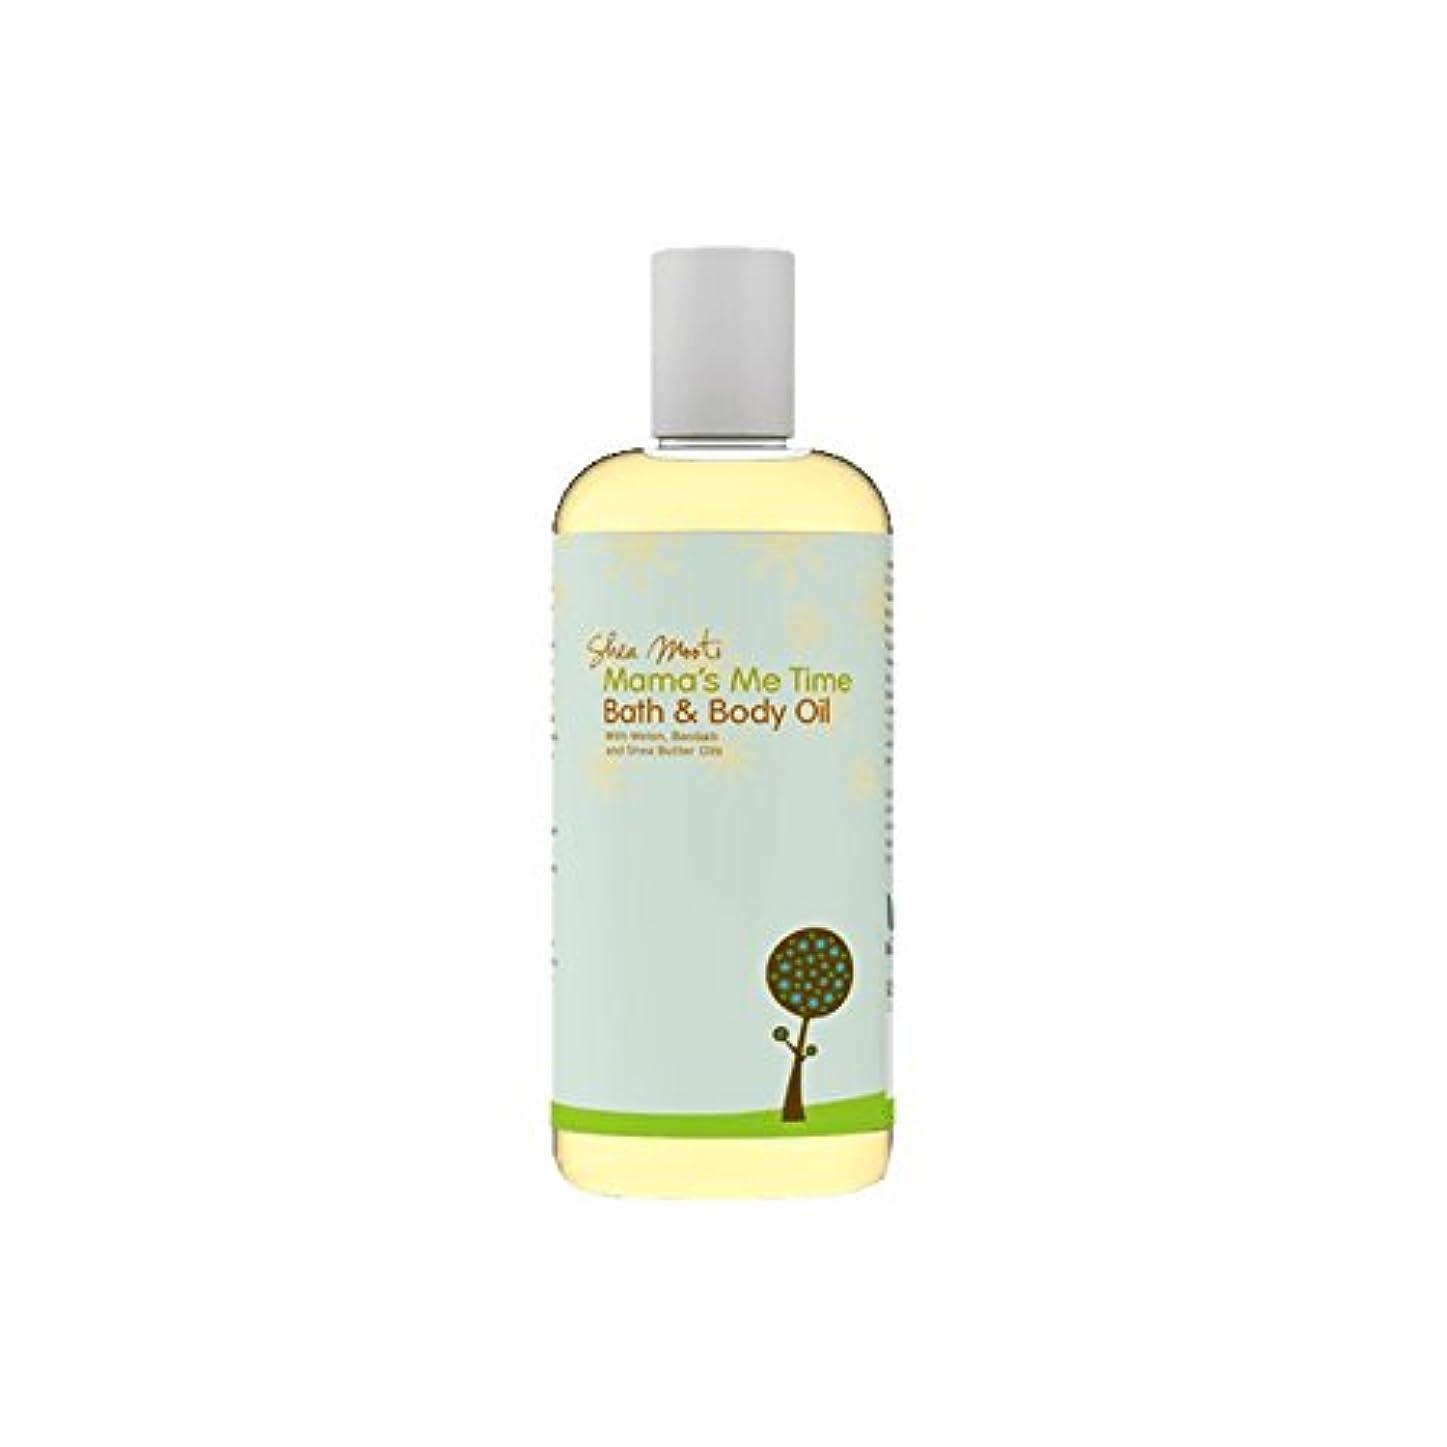 Shea Mooti Mama's Me Time Bath and Body Oil 110g (Pack of 6) - シアバターMootiママの私の時間のバス、ボディオイル110グラム (x6) [並行輸入品]